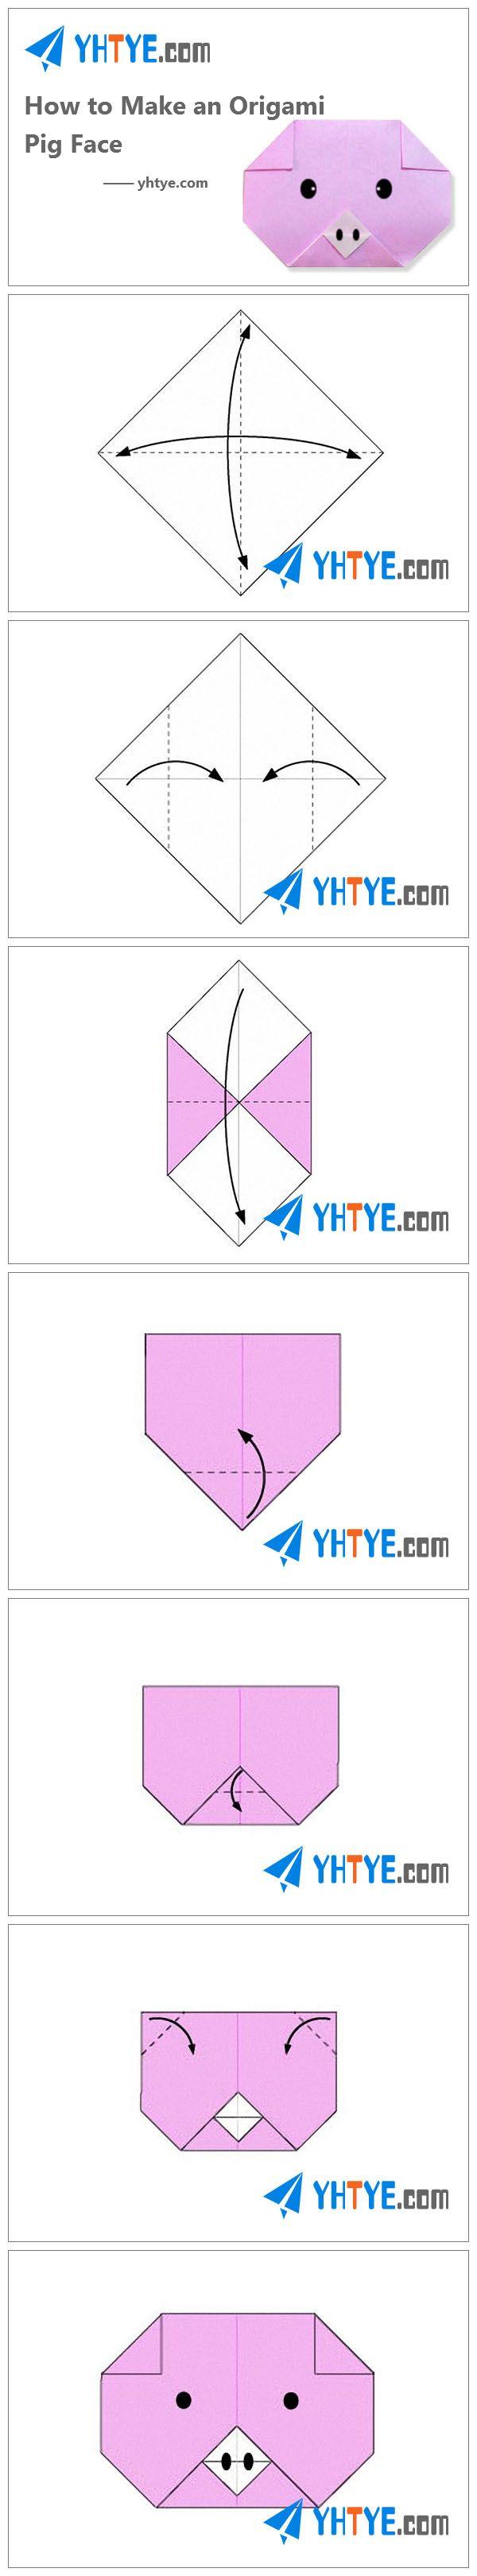 Pes 25 nejlepch npad na tma papper pig na pinterestu how to make an origami pig face pooptronica